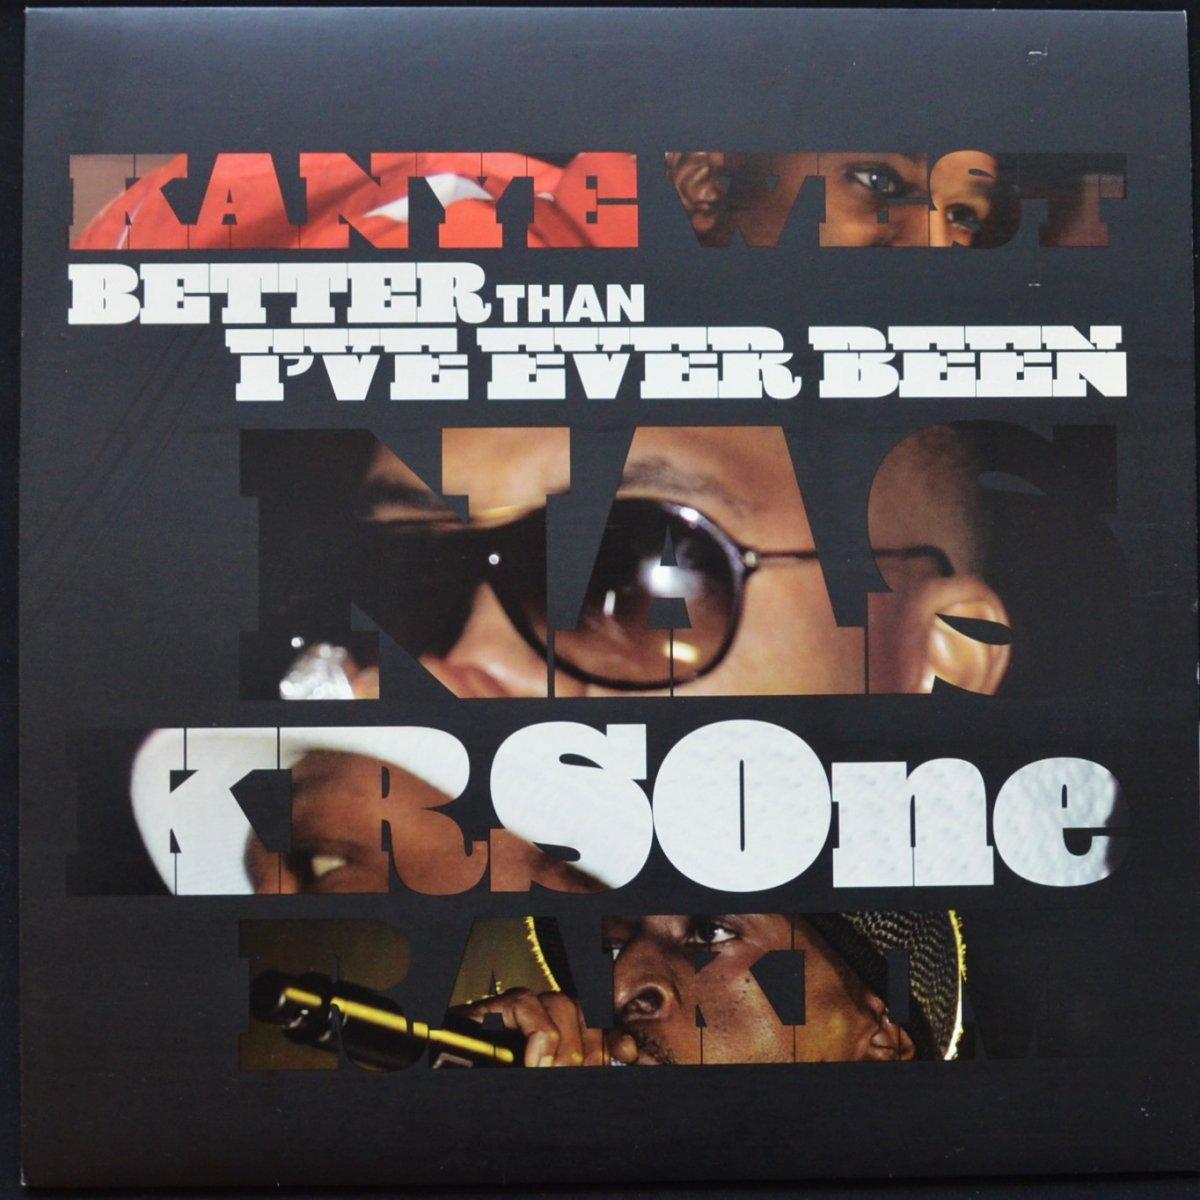 KANYE WEST / NAS / KRS-ONE / RAKIM / BETTER THAN I'VE EVER BEEN / CLASSIC DJ PREMIER REMIX (12